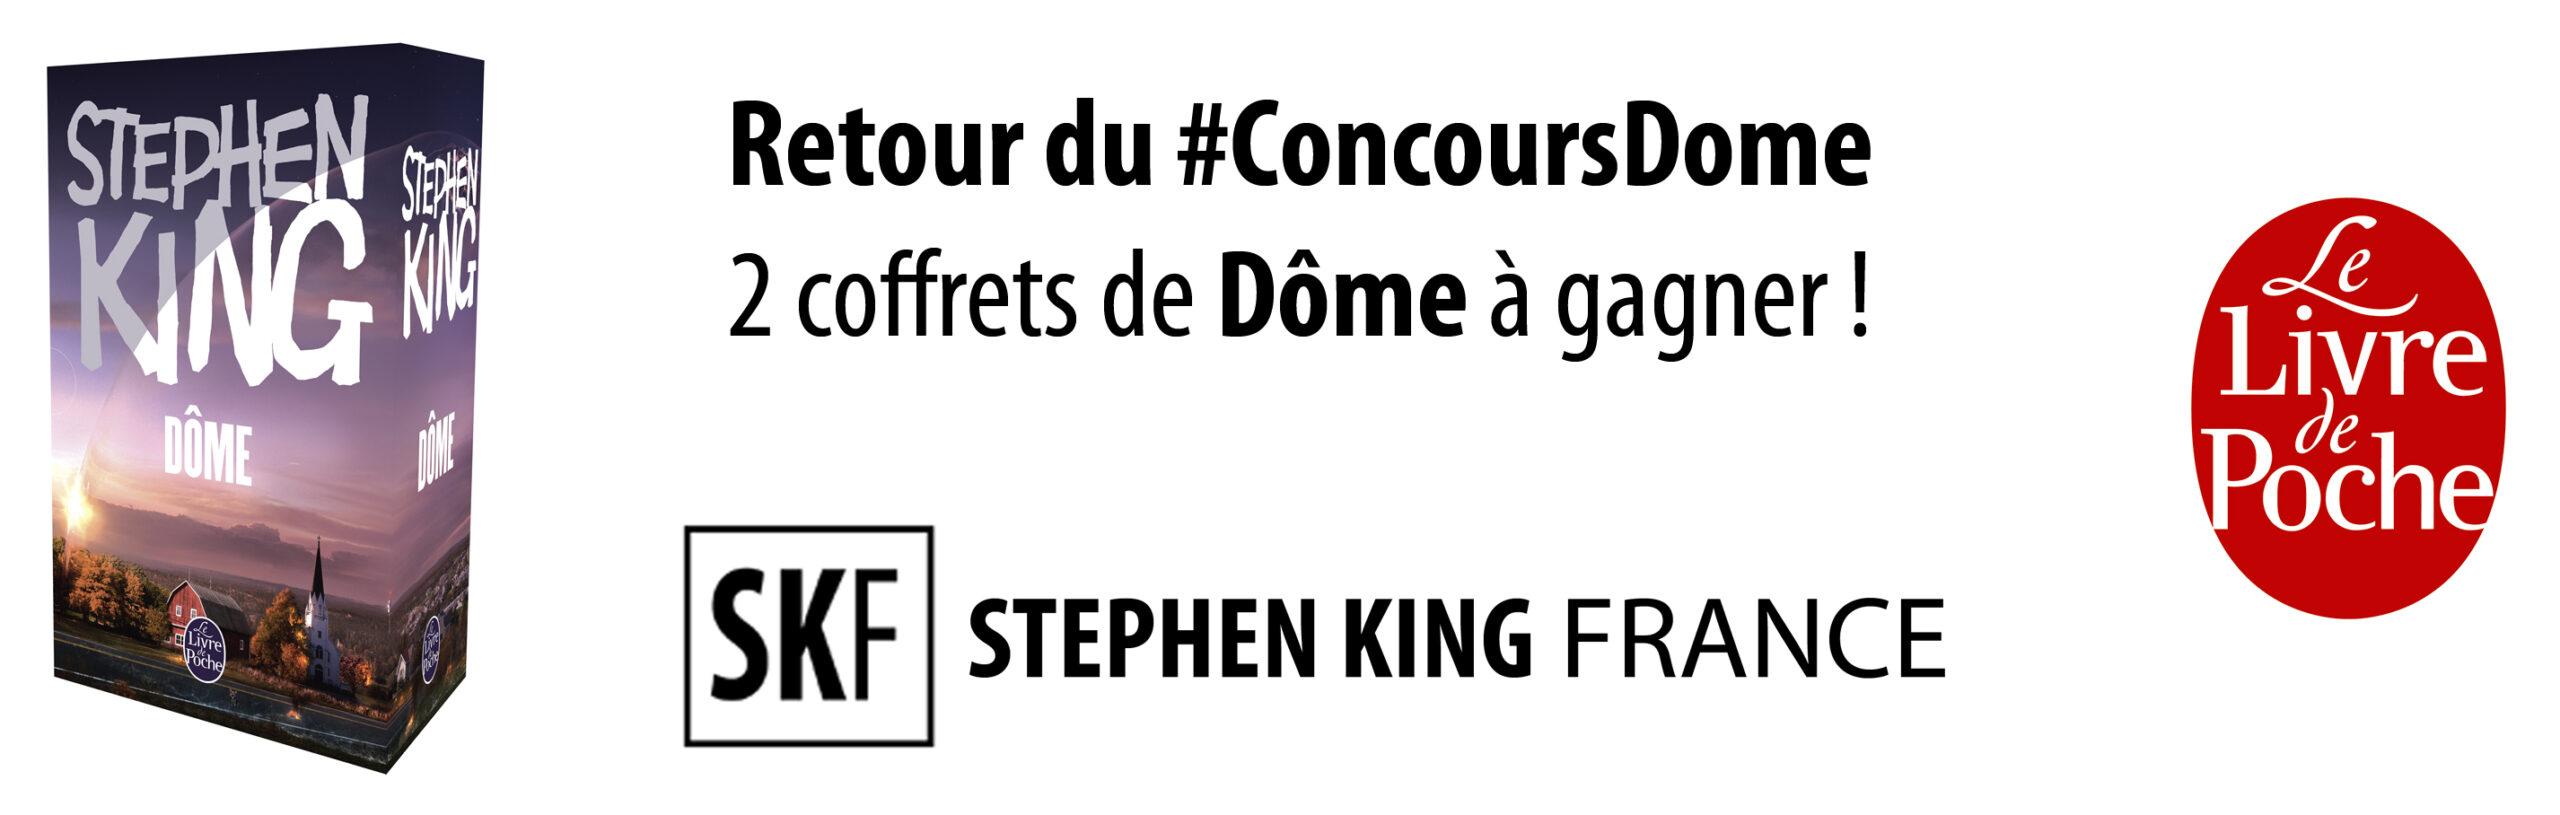 ConcoursDome